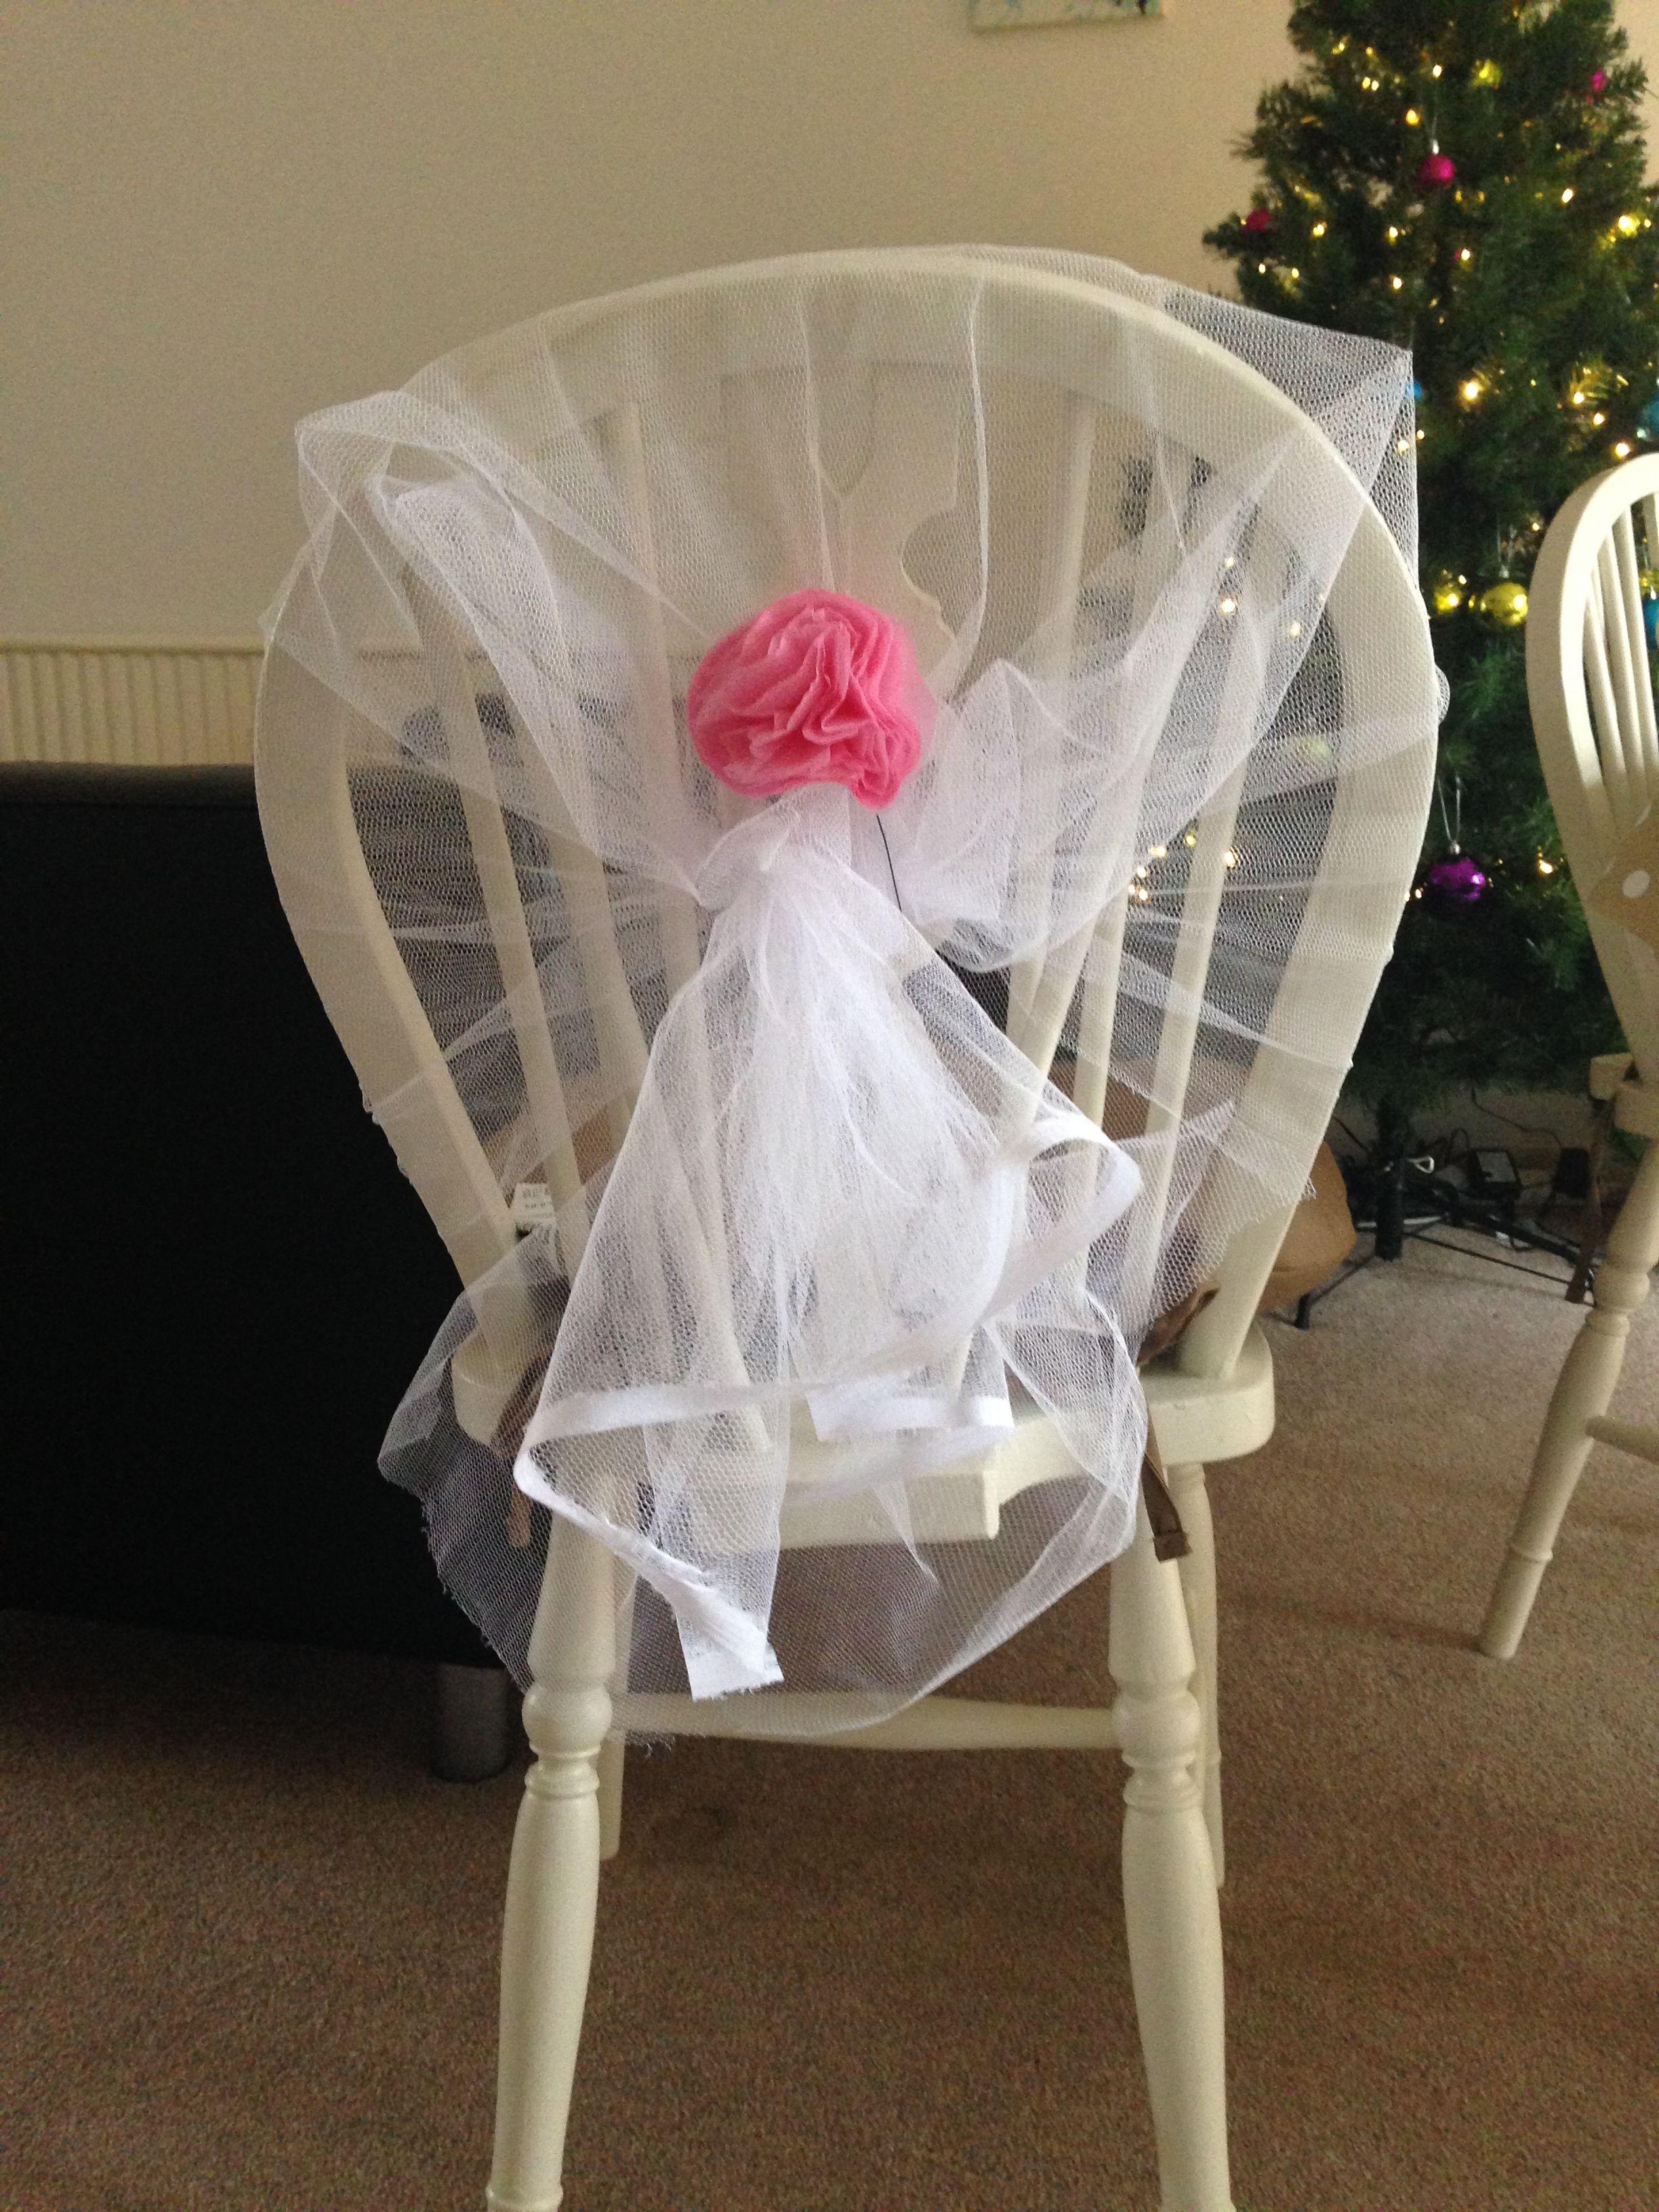 Chair Cover Diy IKEA Poang Chair Cover Sypsie Designs Diy Folding